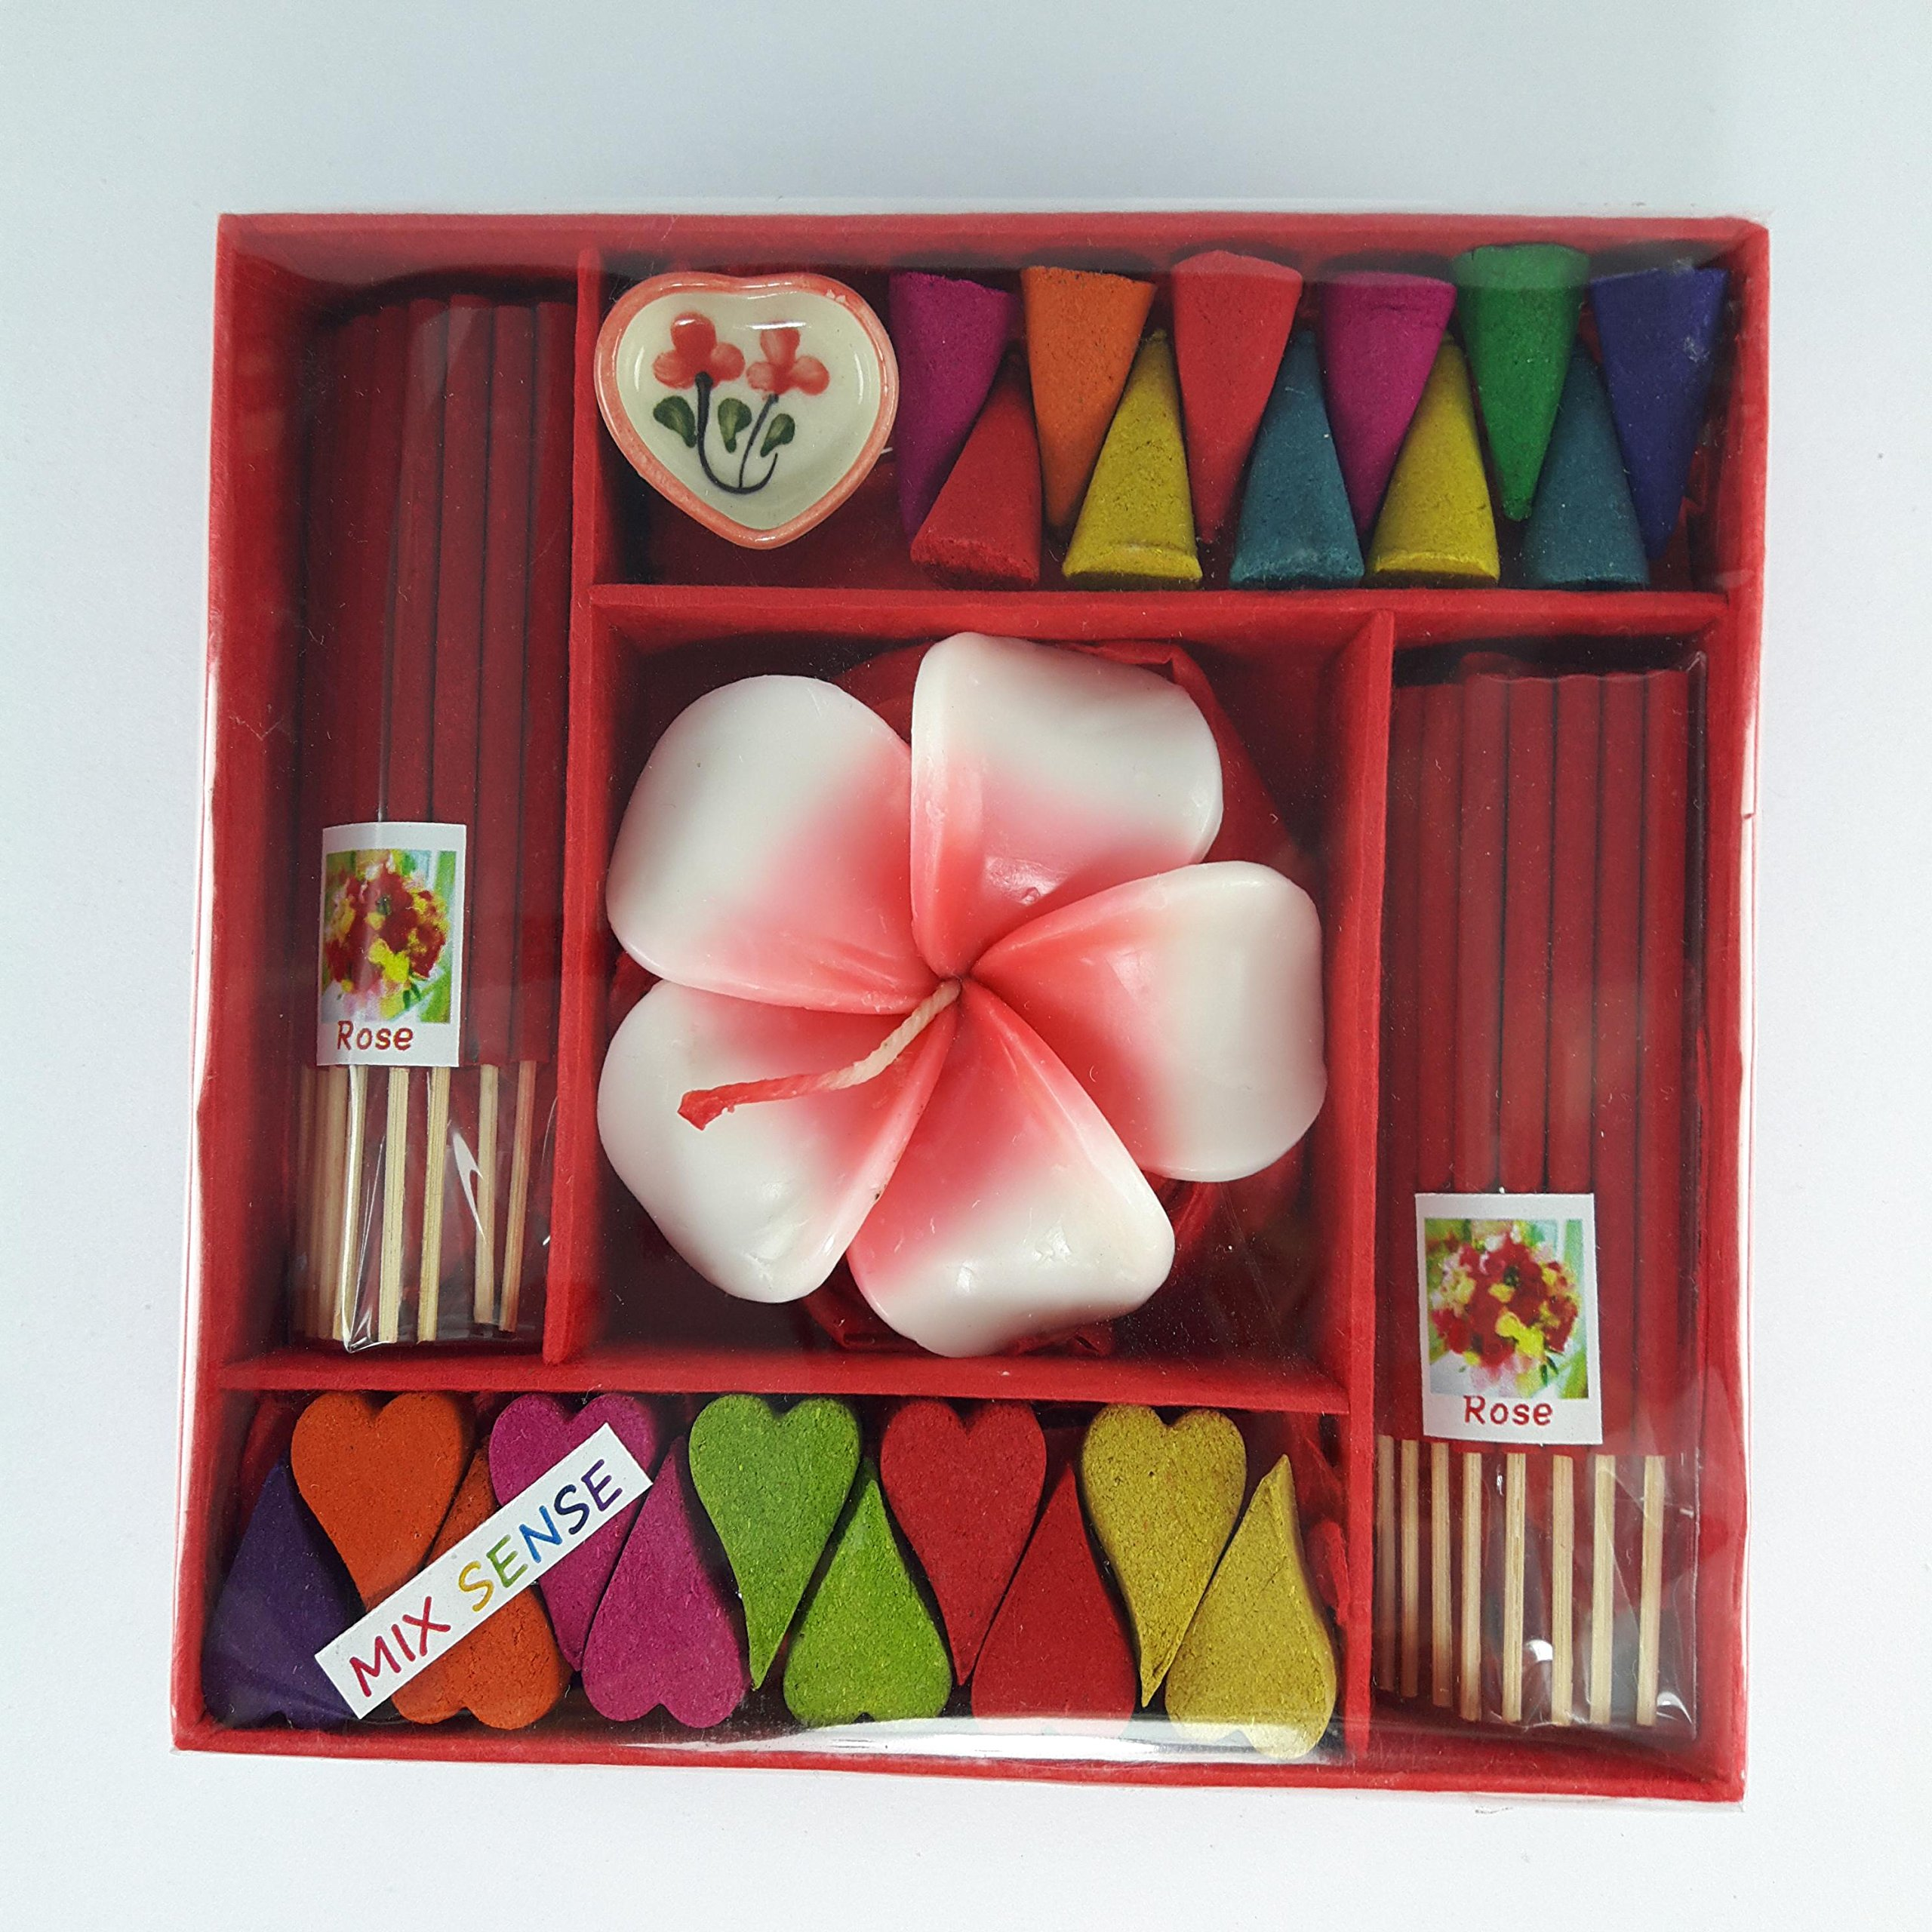 kornkorn87 Incense Spa Aroma Rose Fragrance Cones Burner Holder Thai Scent Relax Sticks Ceramic Home Gift